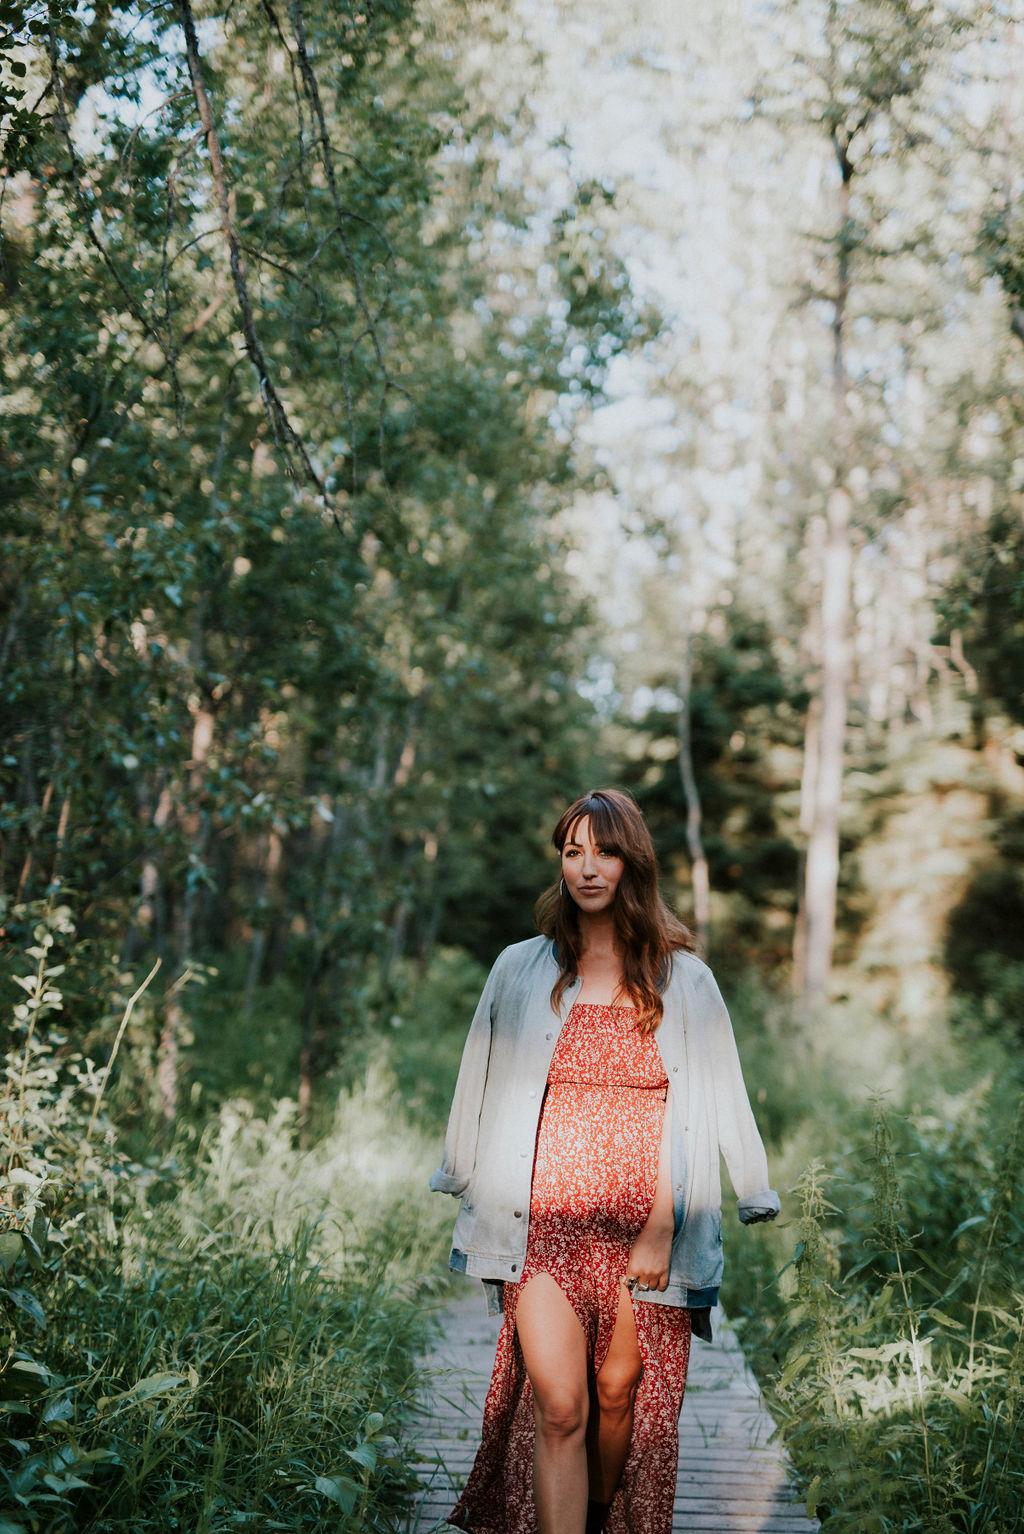 karmen-meyer-photography-outdoor-boudoir-gull-lake-edmonton-21836.JPG